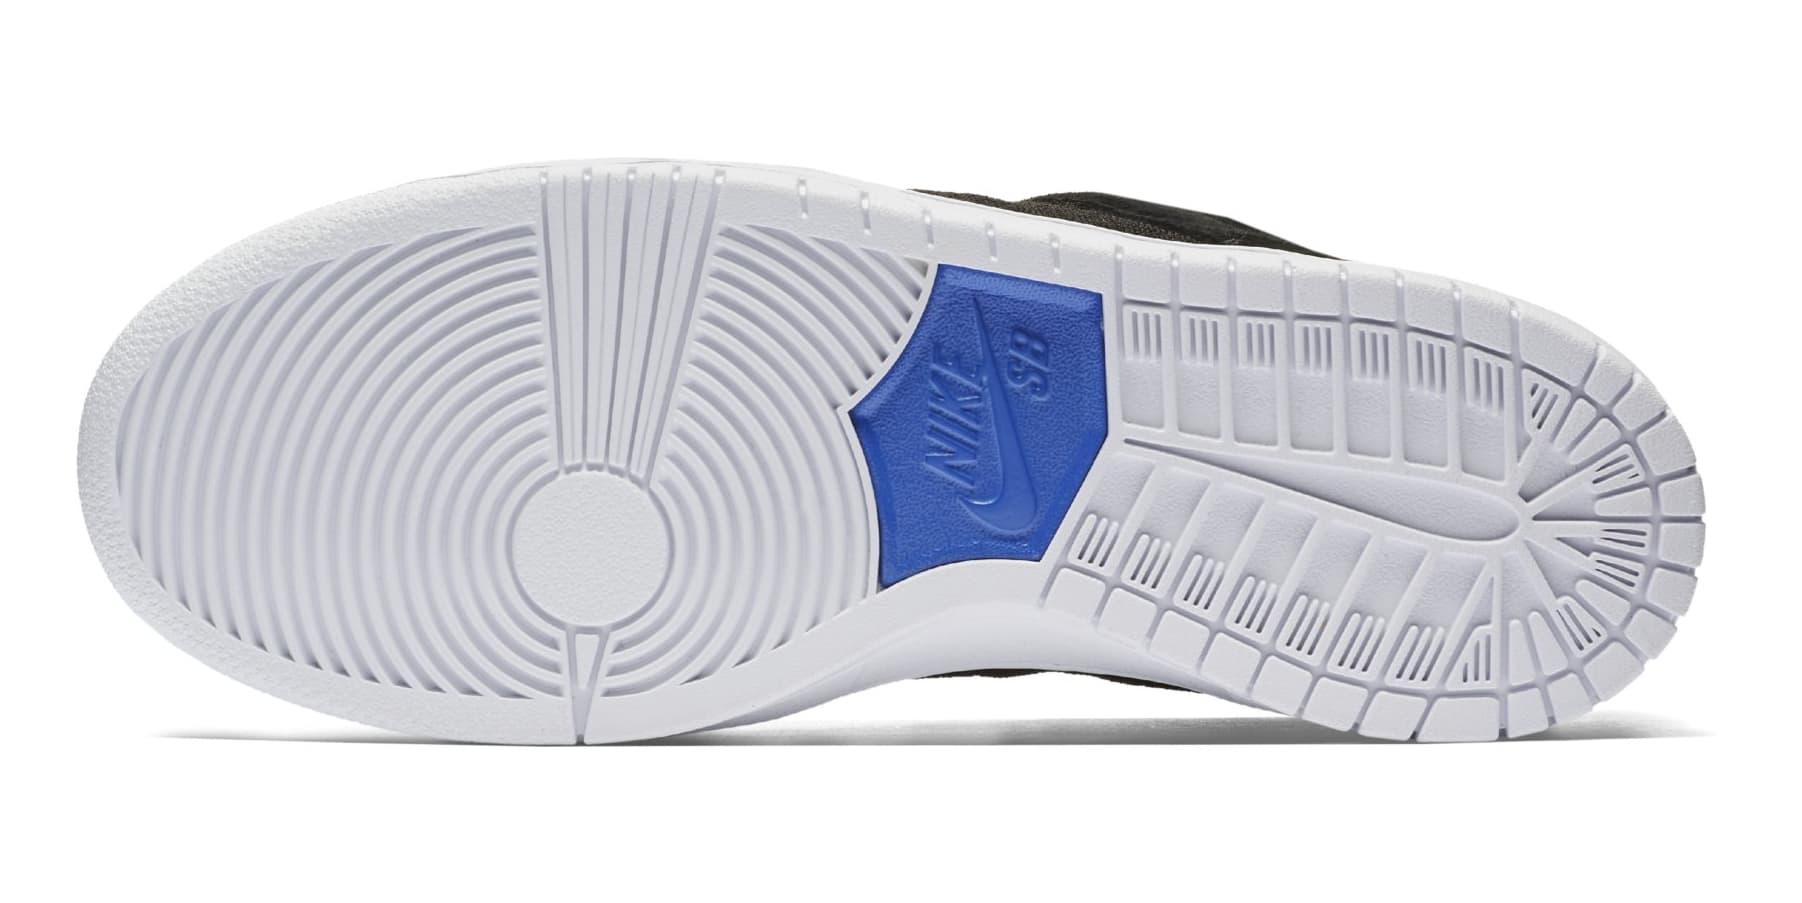 Soulland x Nike SB Dunk Low 918288-041 (Bottom)